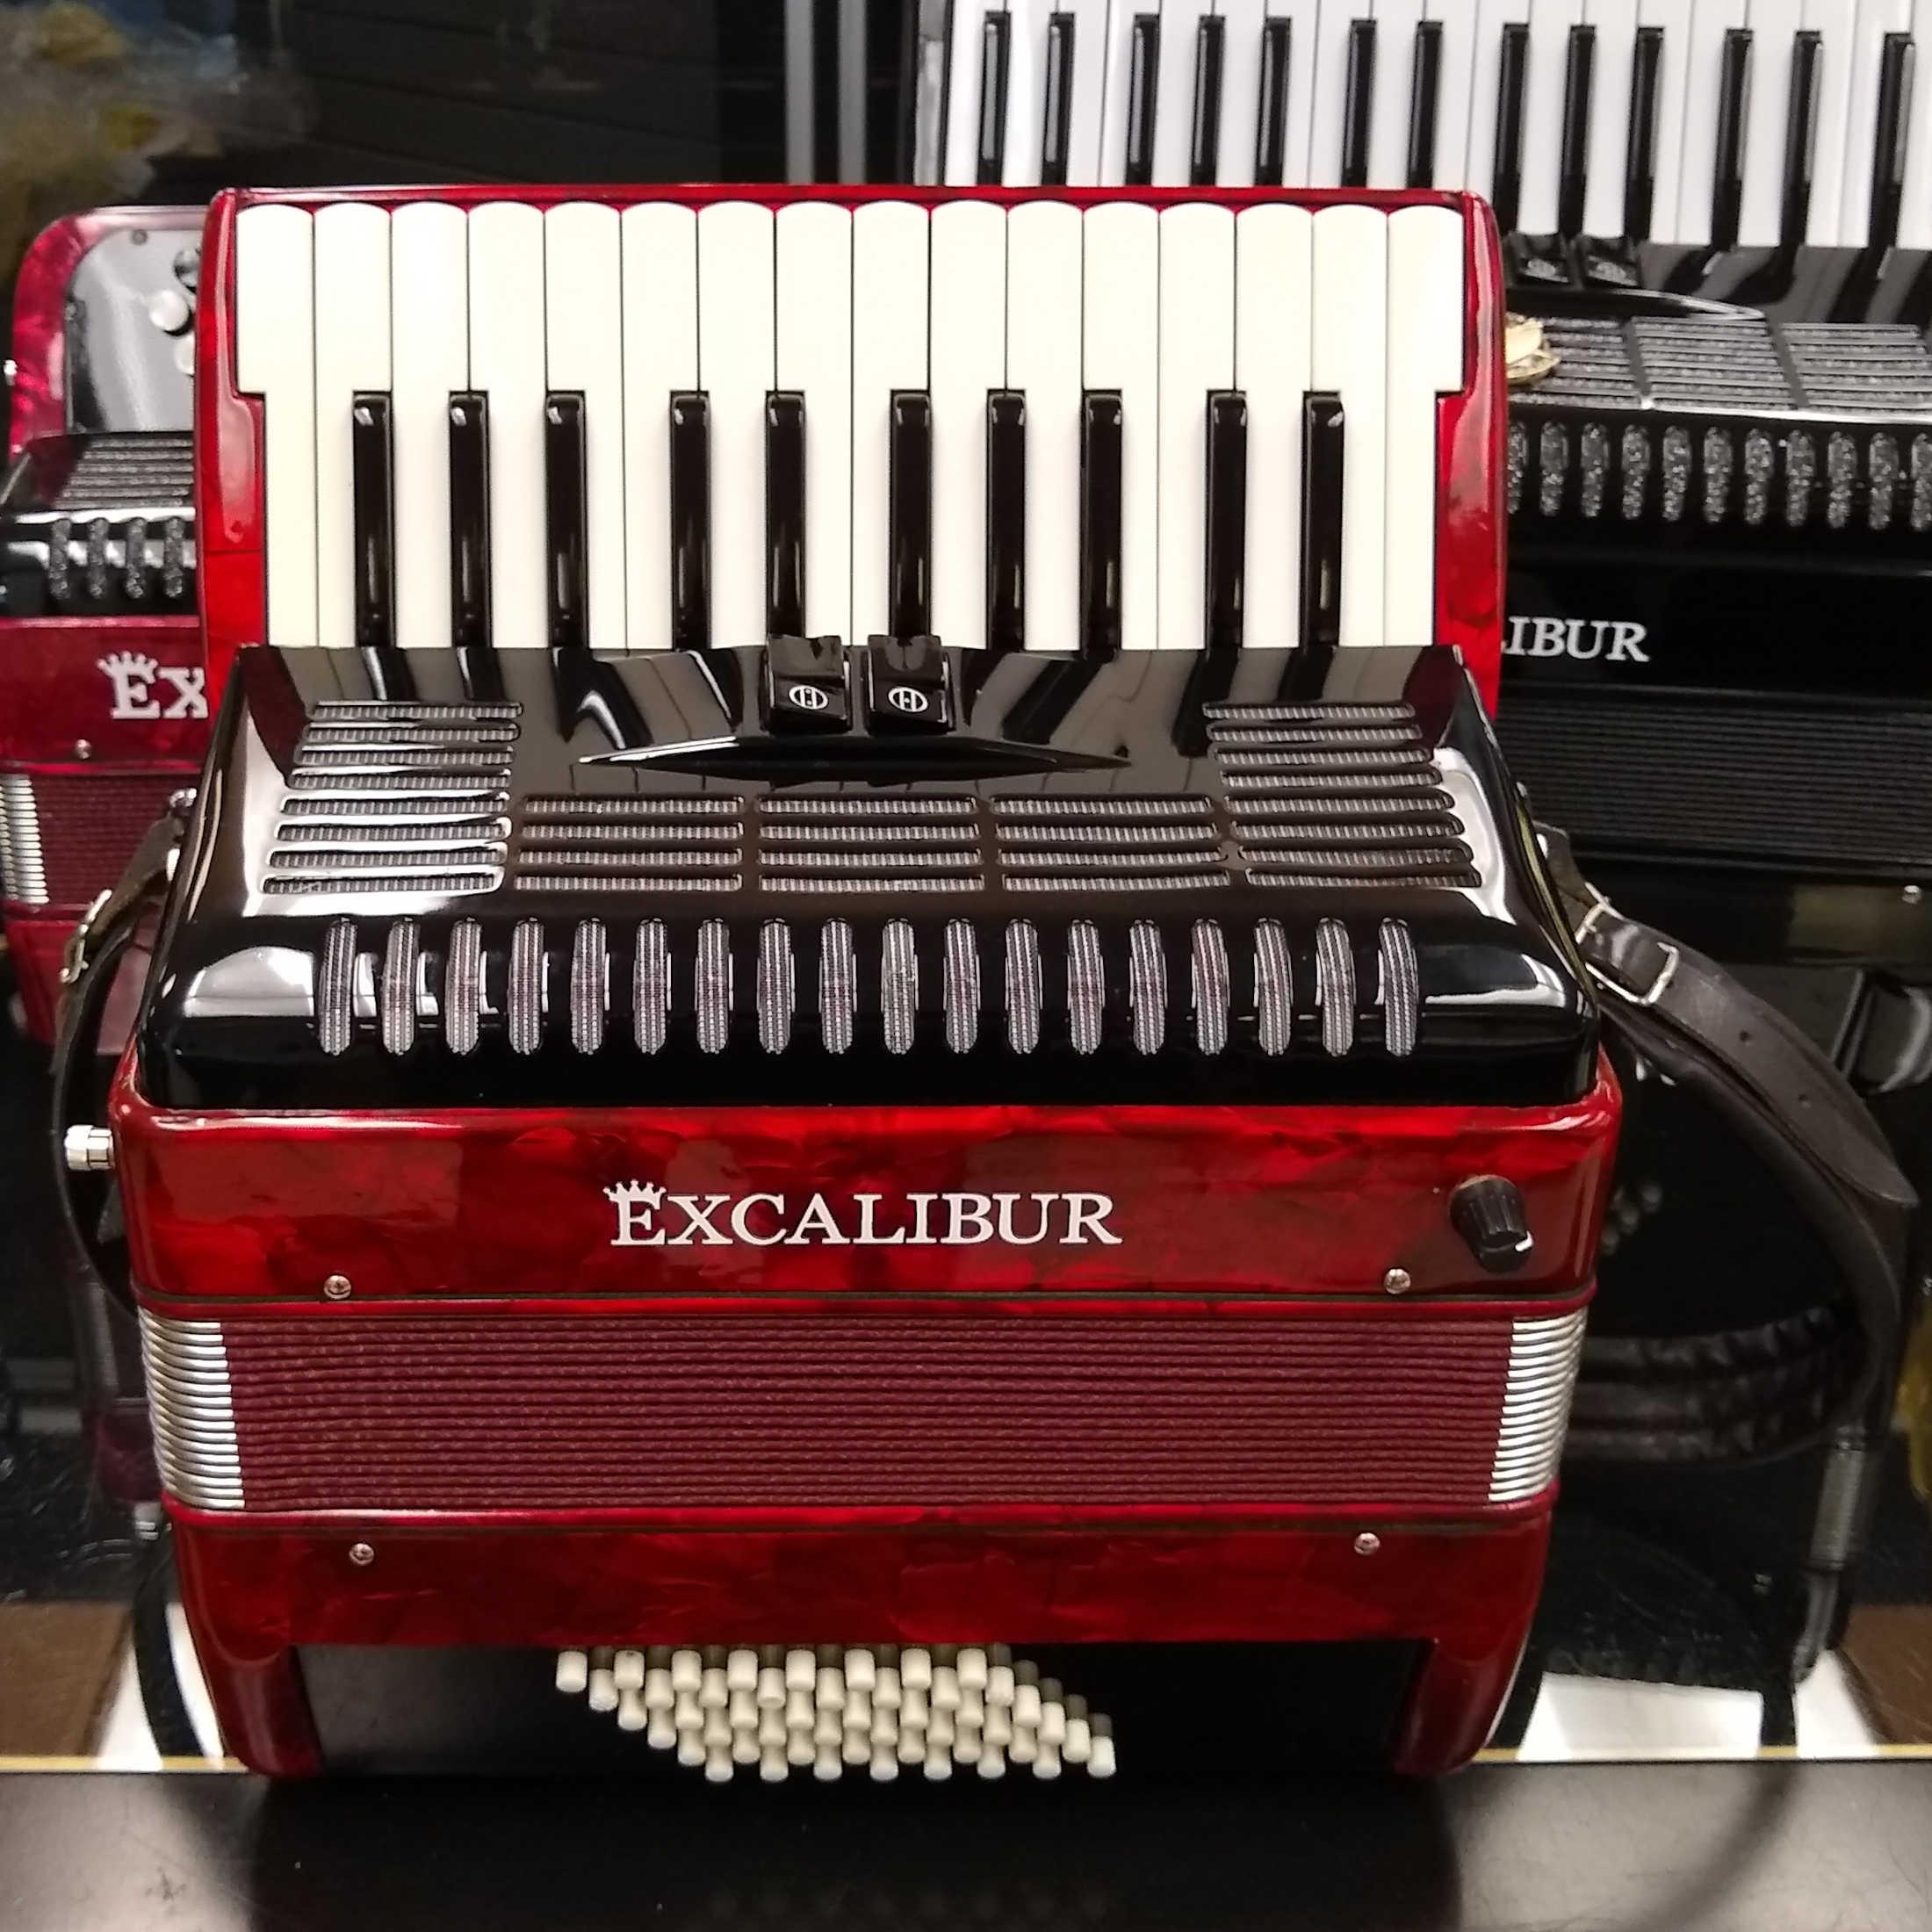 Excalibur 48 Bass Weltbestin Model Piano Accordion - Red Polish